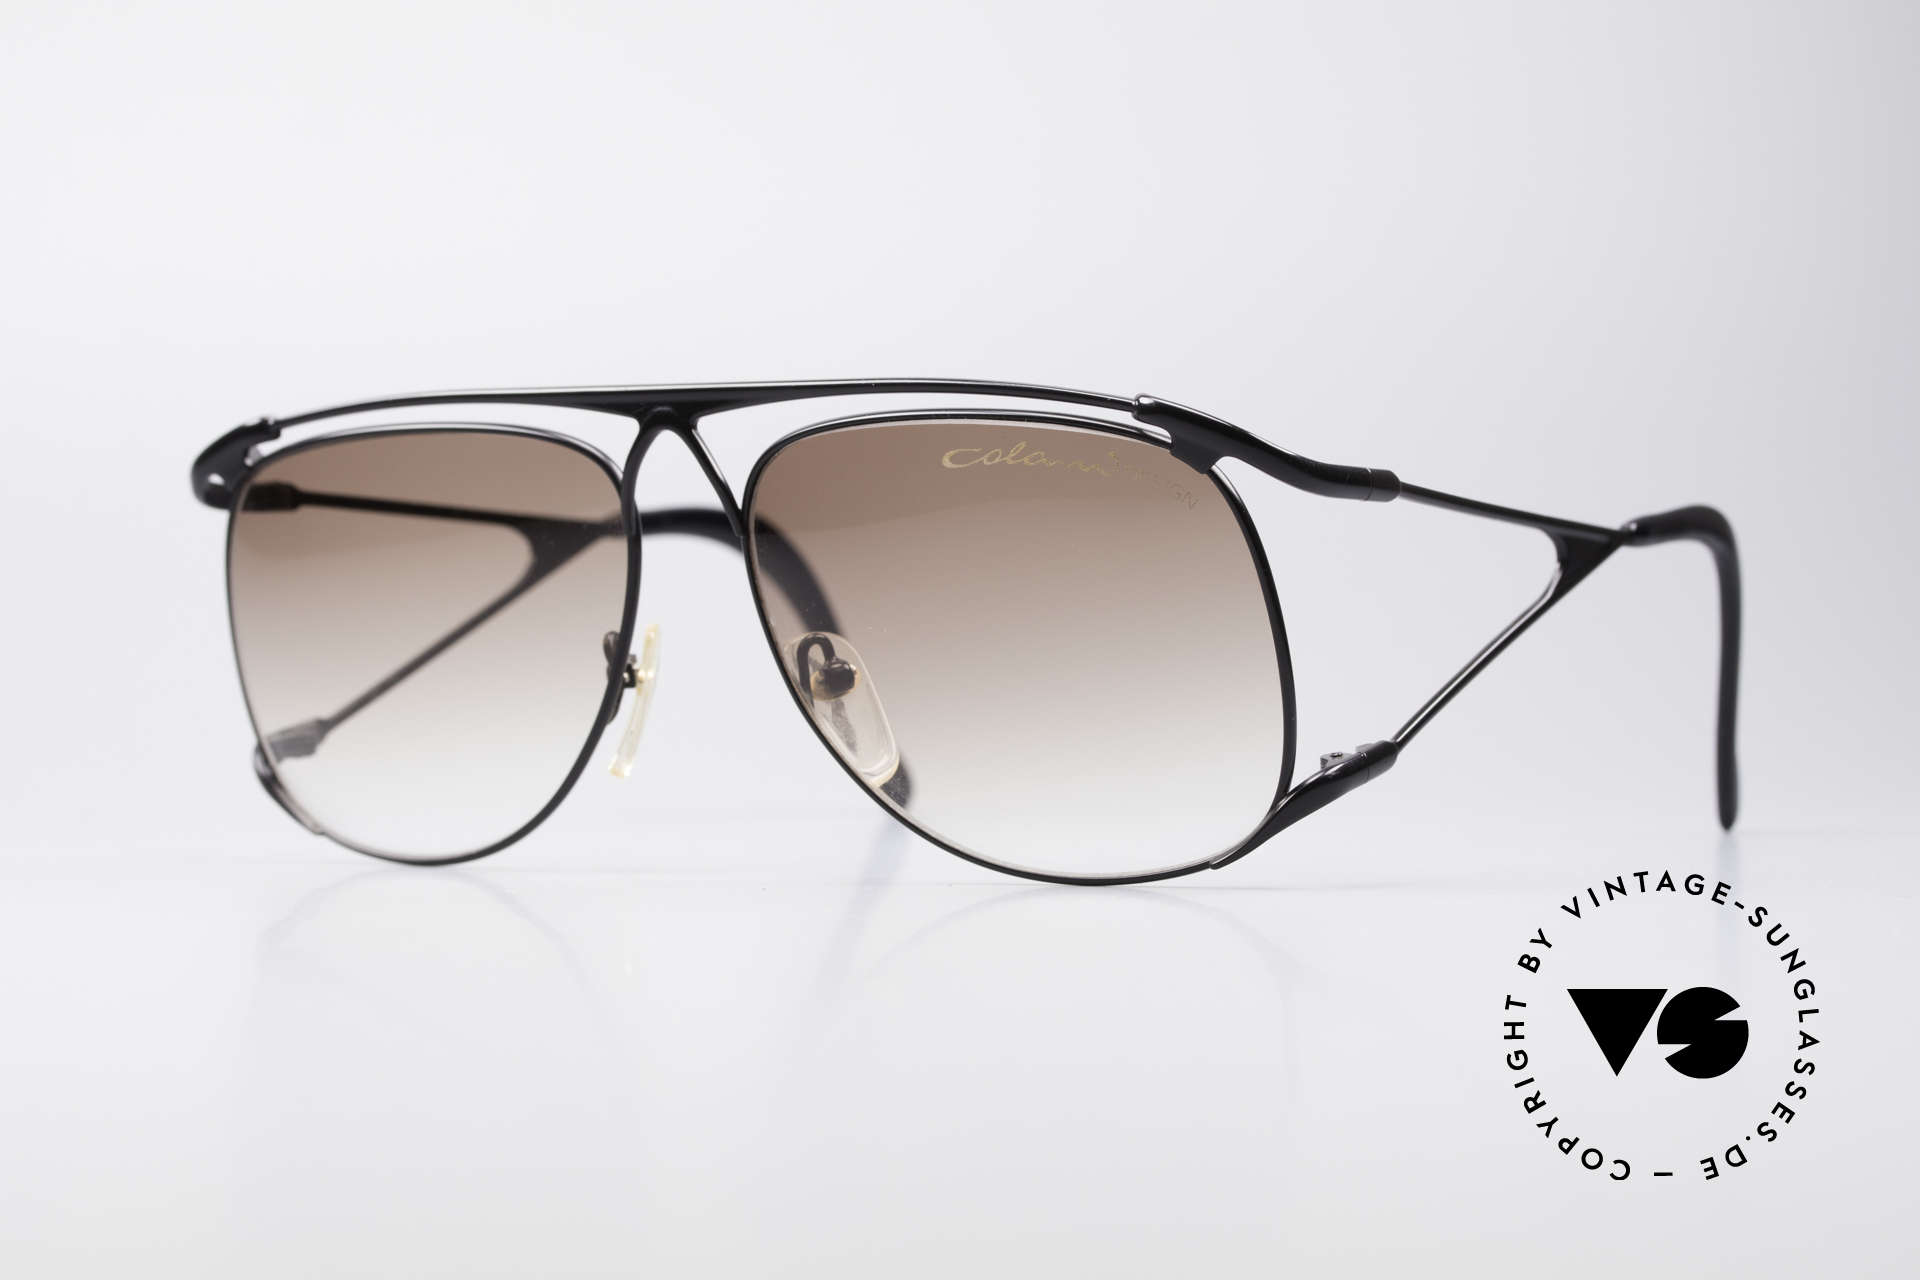 Colani 15-501 Rare 80's Designer Glasses, very flashy Luigi Colani sunglasses from the 80's, Made for Men